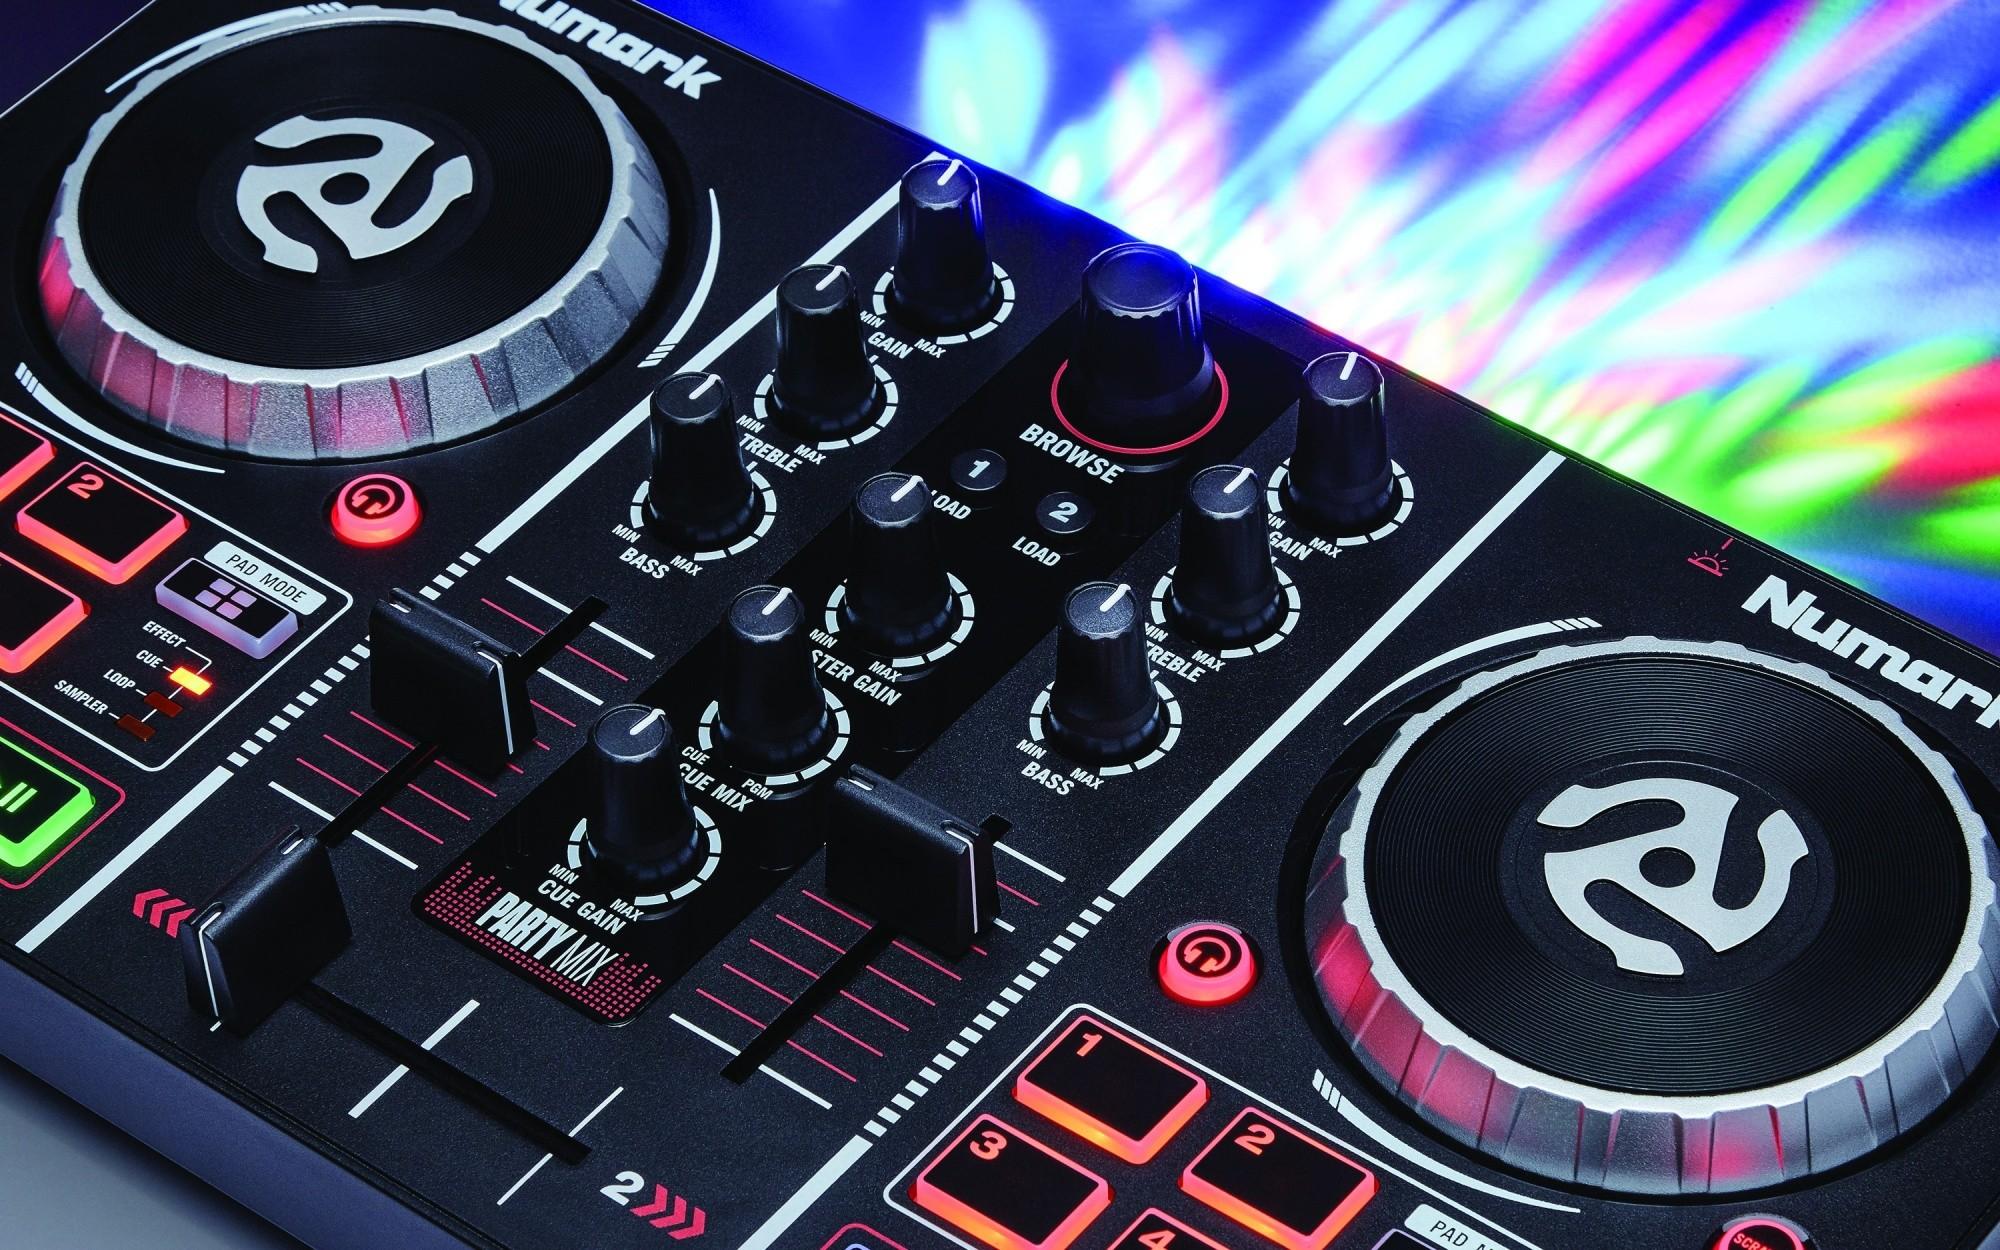 numark party mix starter dj controller built in sound card rgb light virtual dj ebay. Black Bedroom Furniture Sets. Home Design Ideas